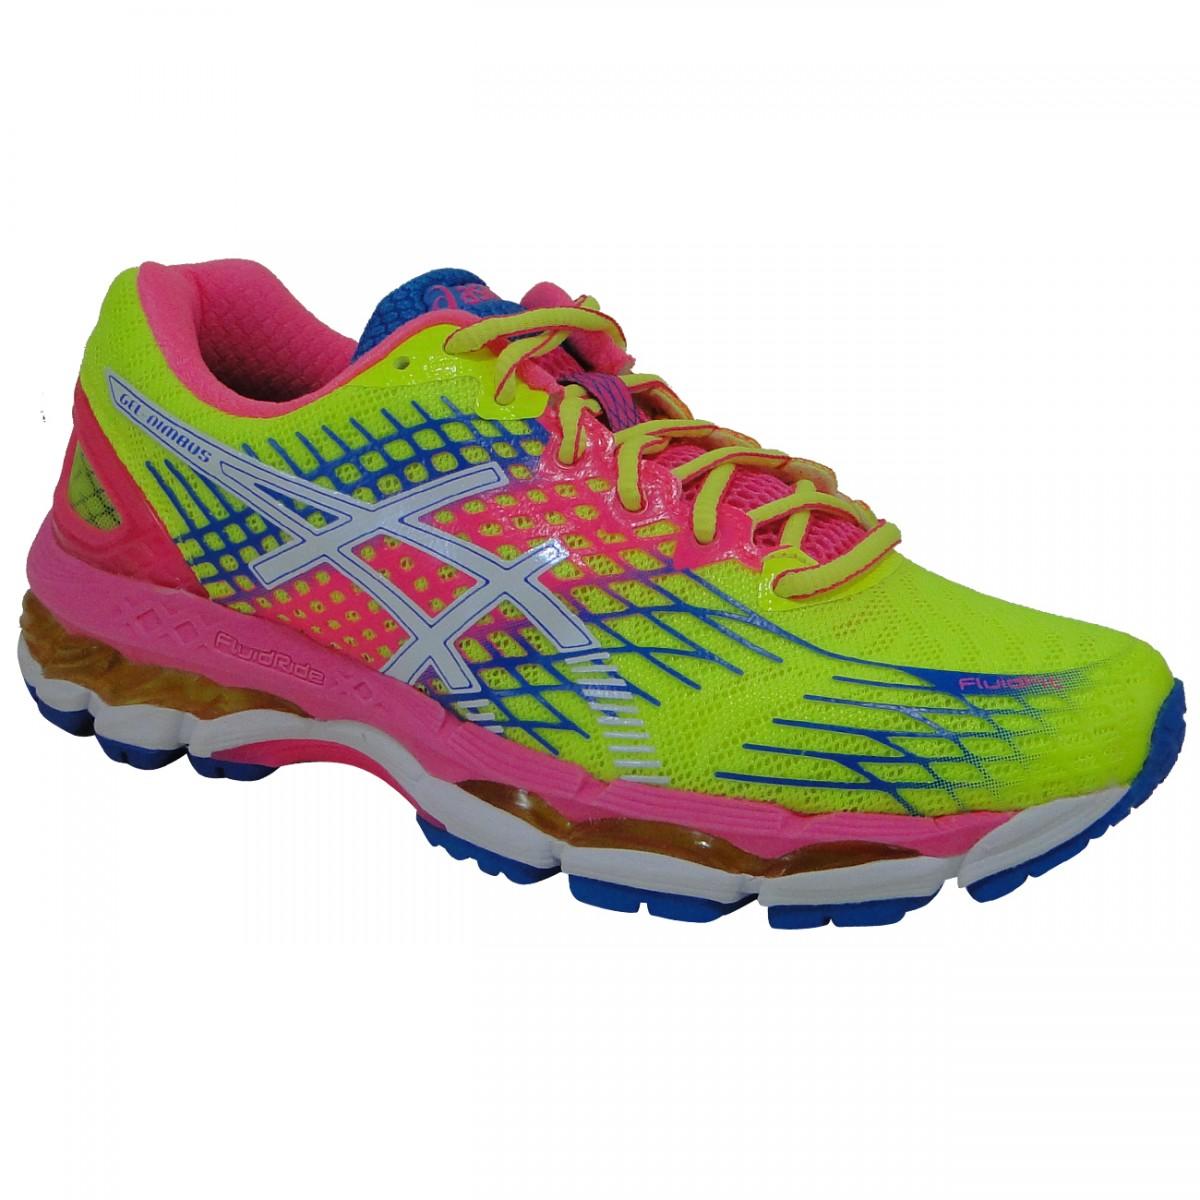 Tenis Asics Gel-Nimbus 17 T557N 0701 - Limão Pink Branco - Chuteira Nike fb1d44ff92289